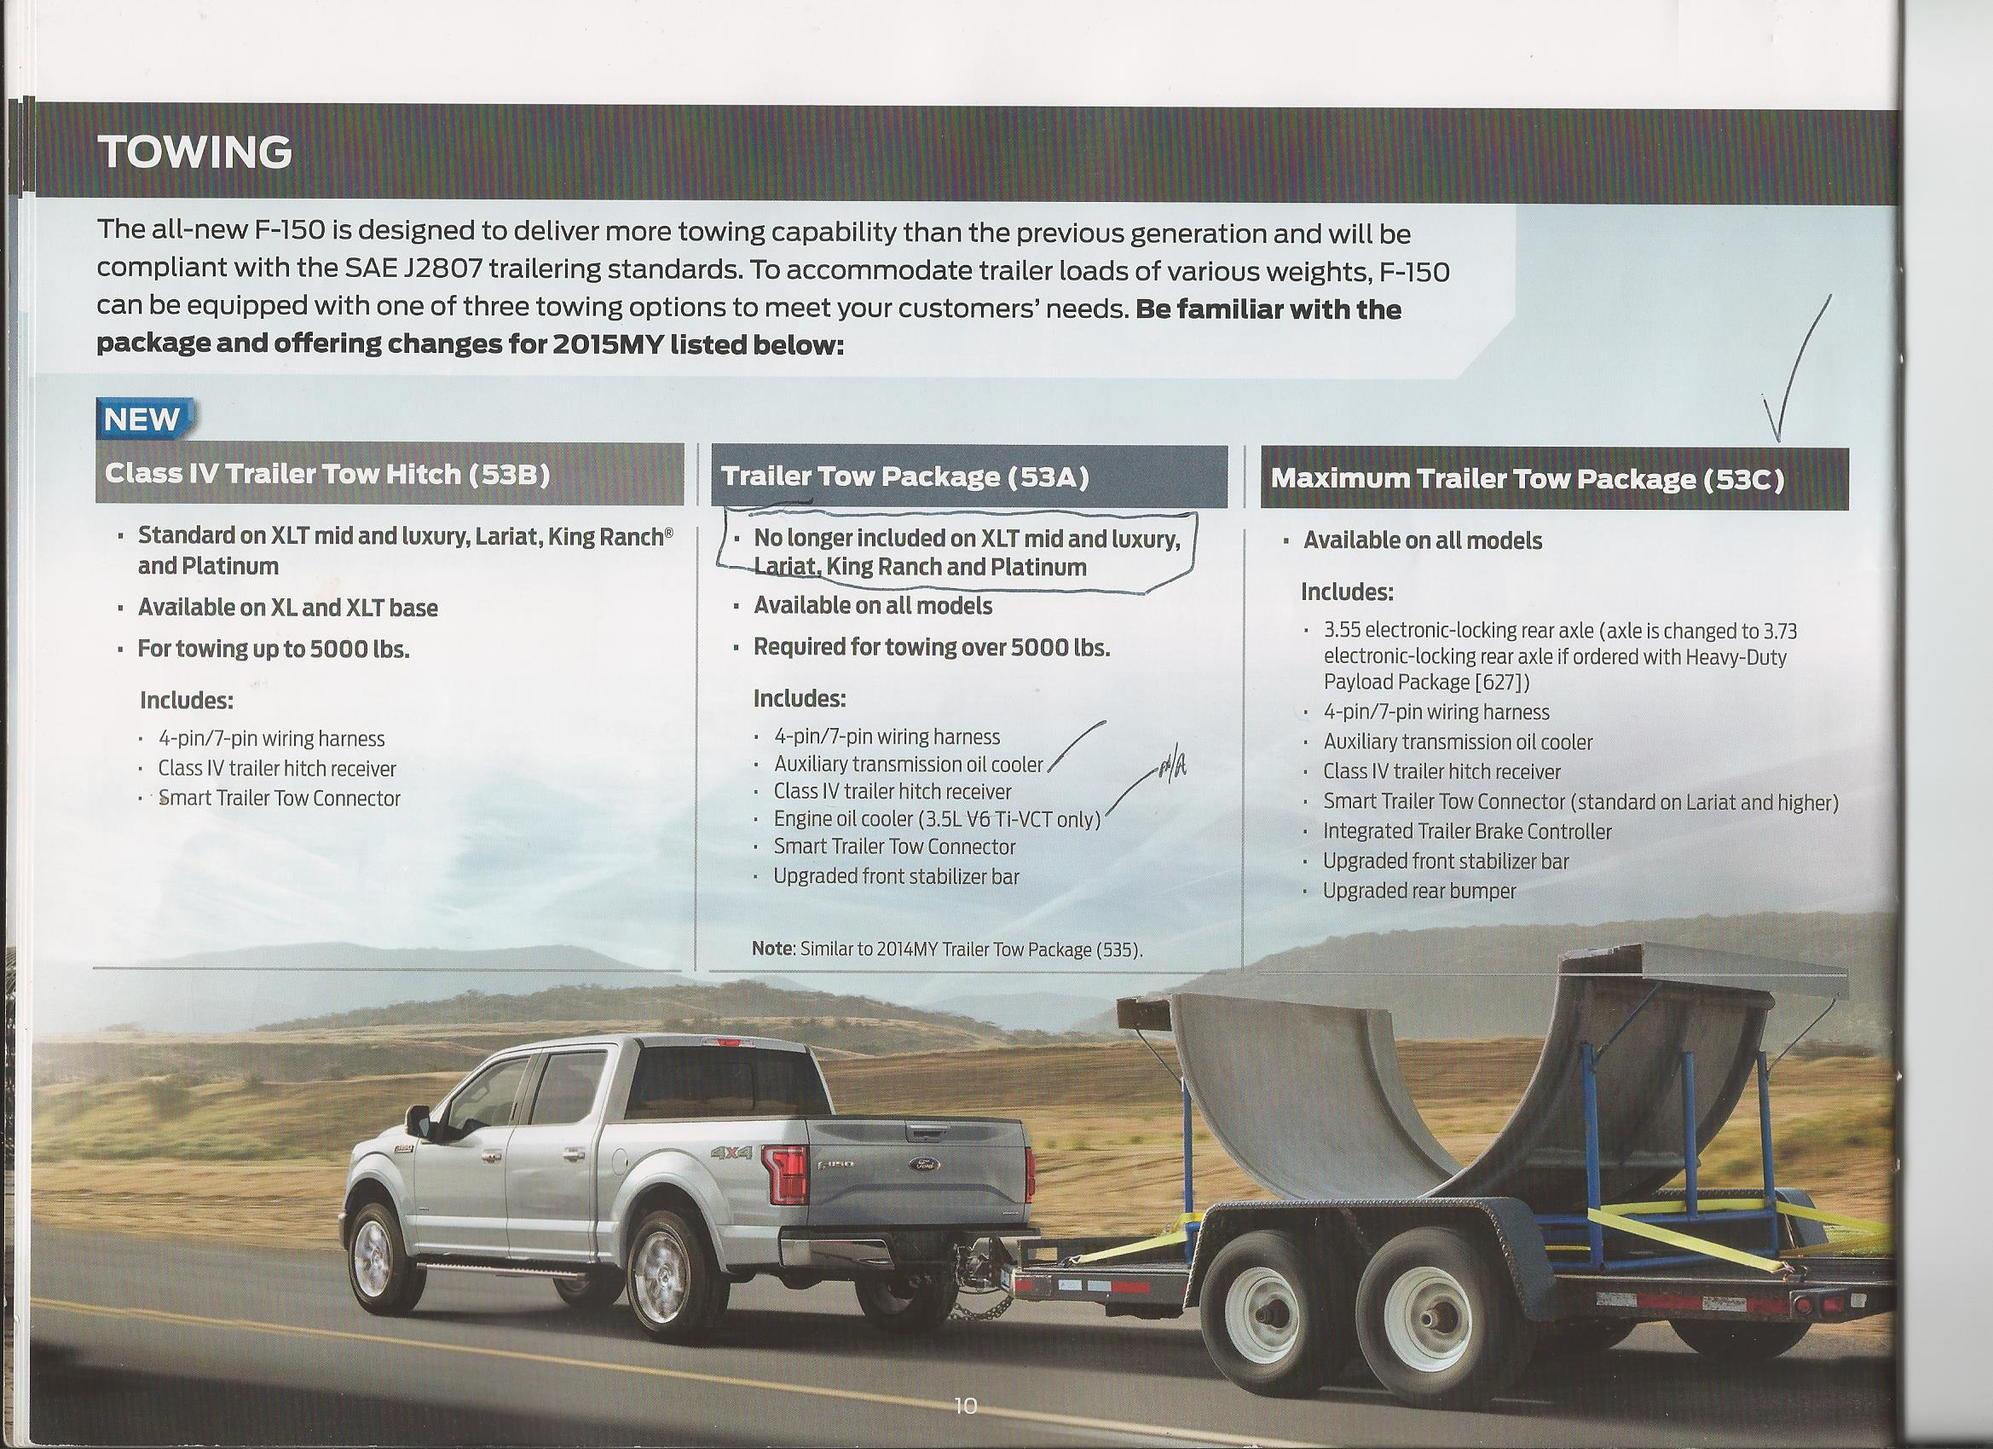 trailer tow wiring w 4 pin connector transmission oil cooler 14 17trailer tow pkg vs max trailer tow pkg ford f150 forum community rh f150forum com